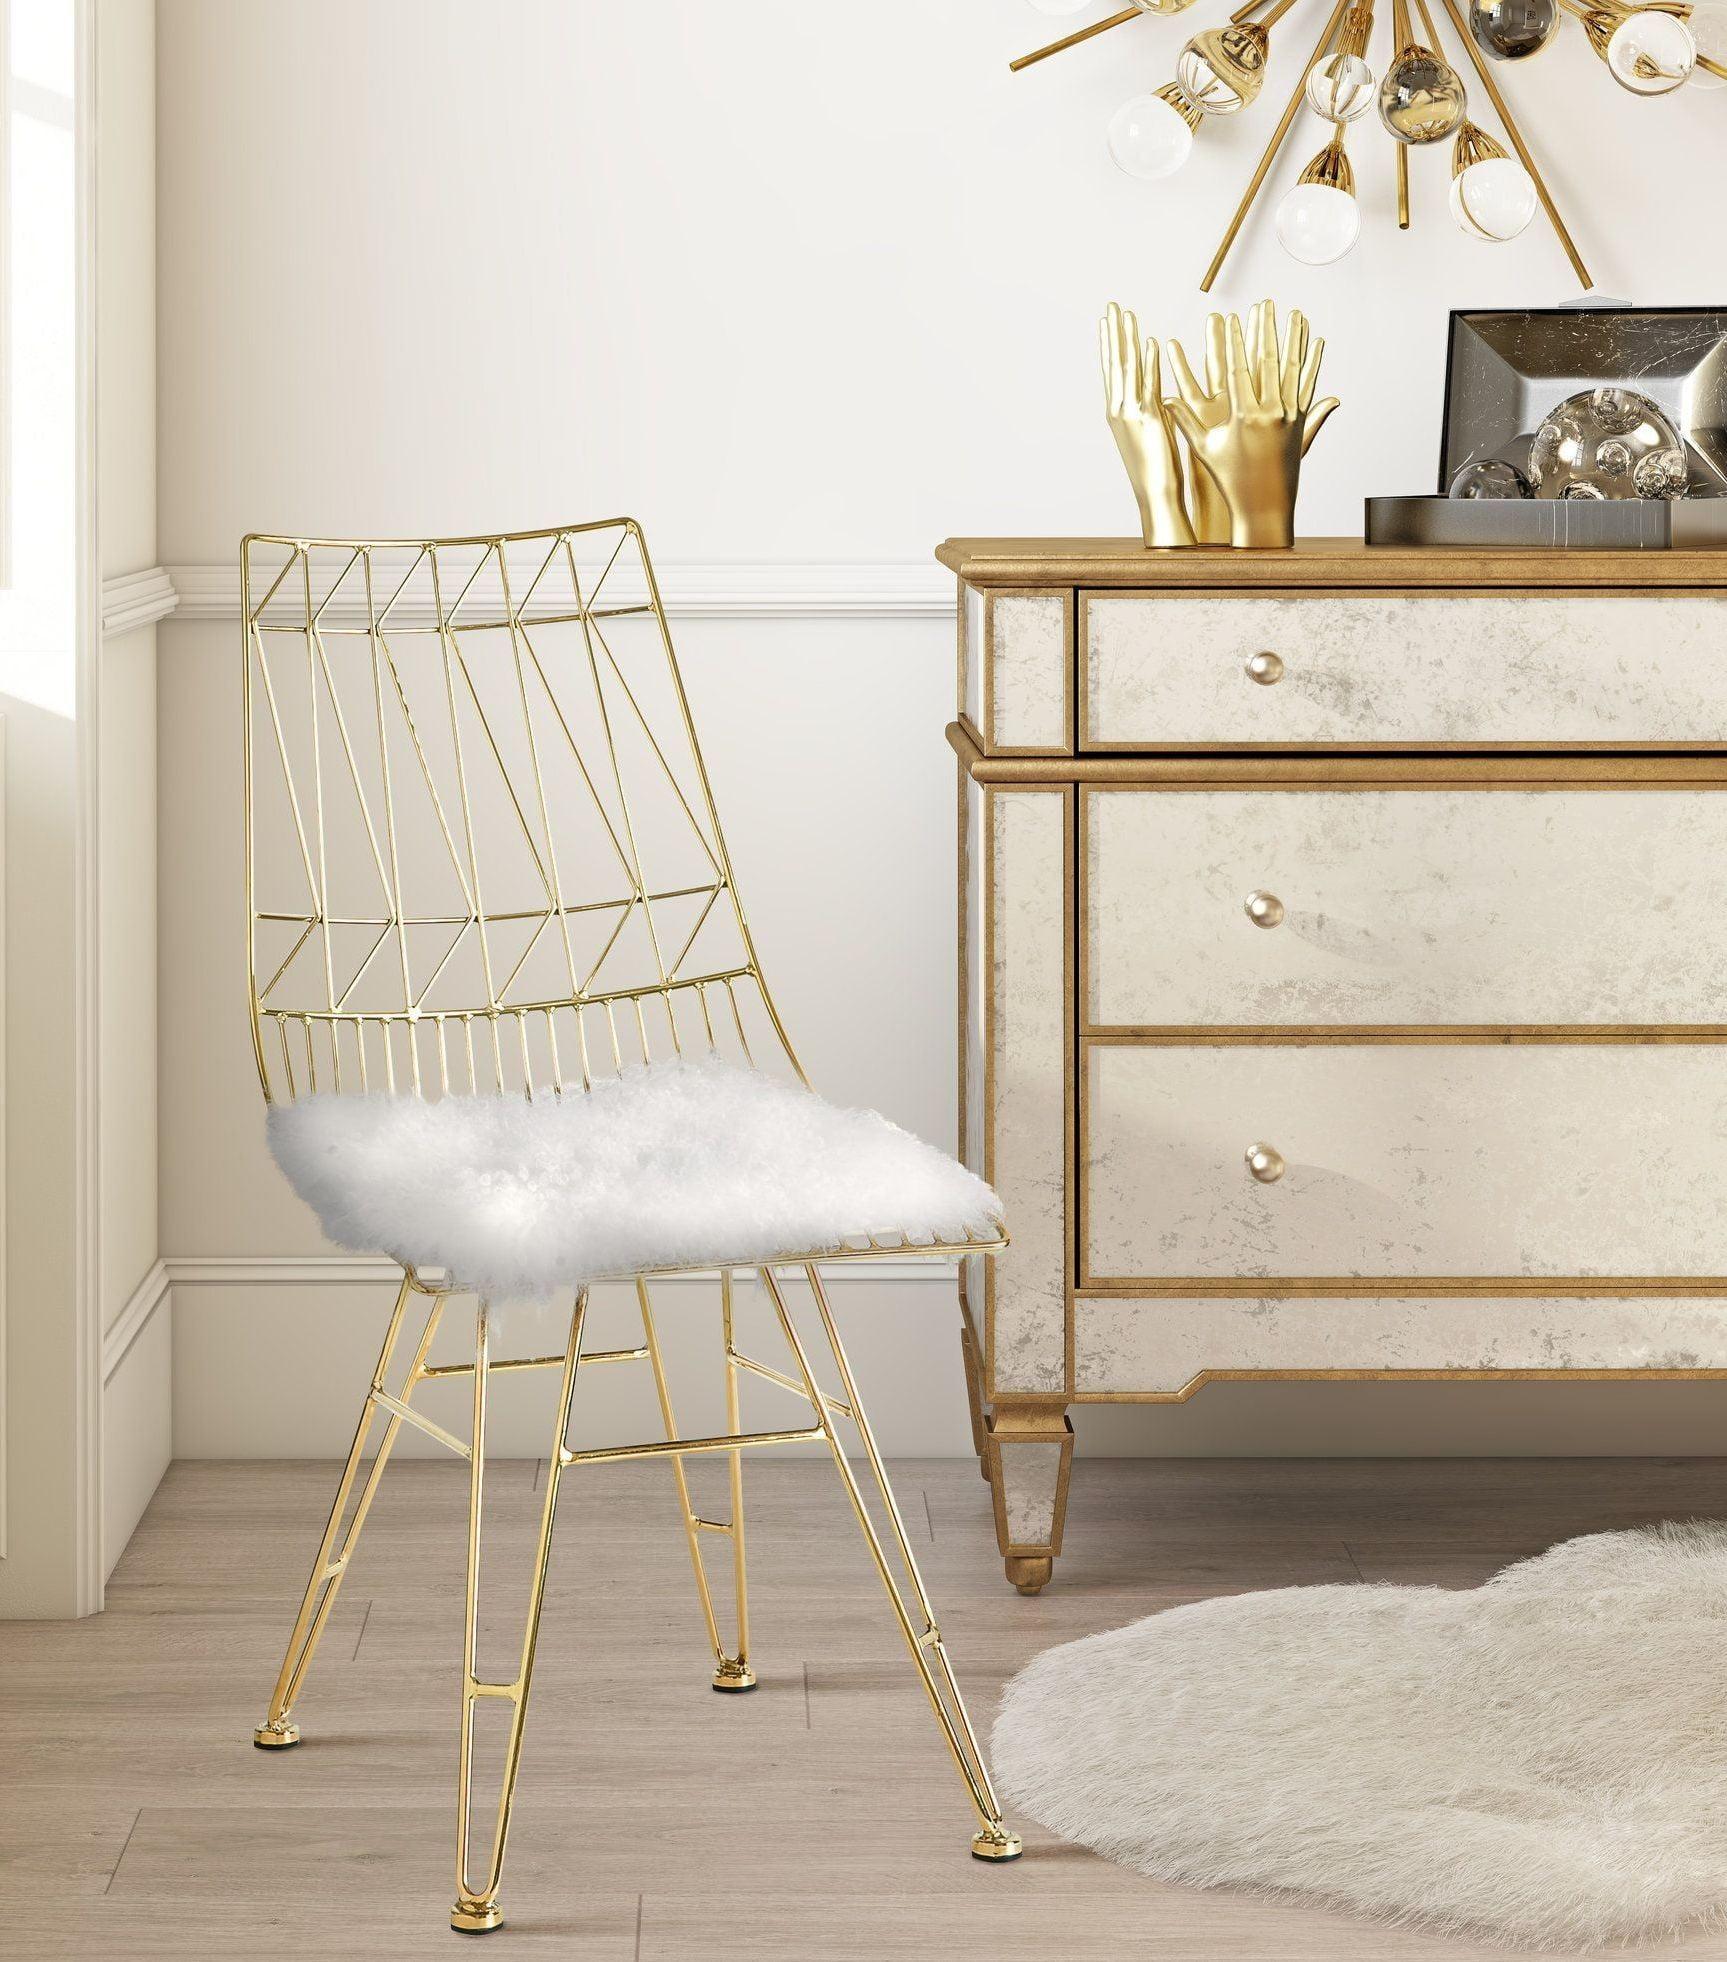 steel chair with cushion iron throne cover allure white sheepskin g7212 g7213